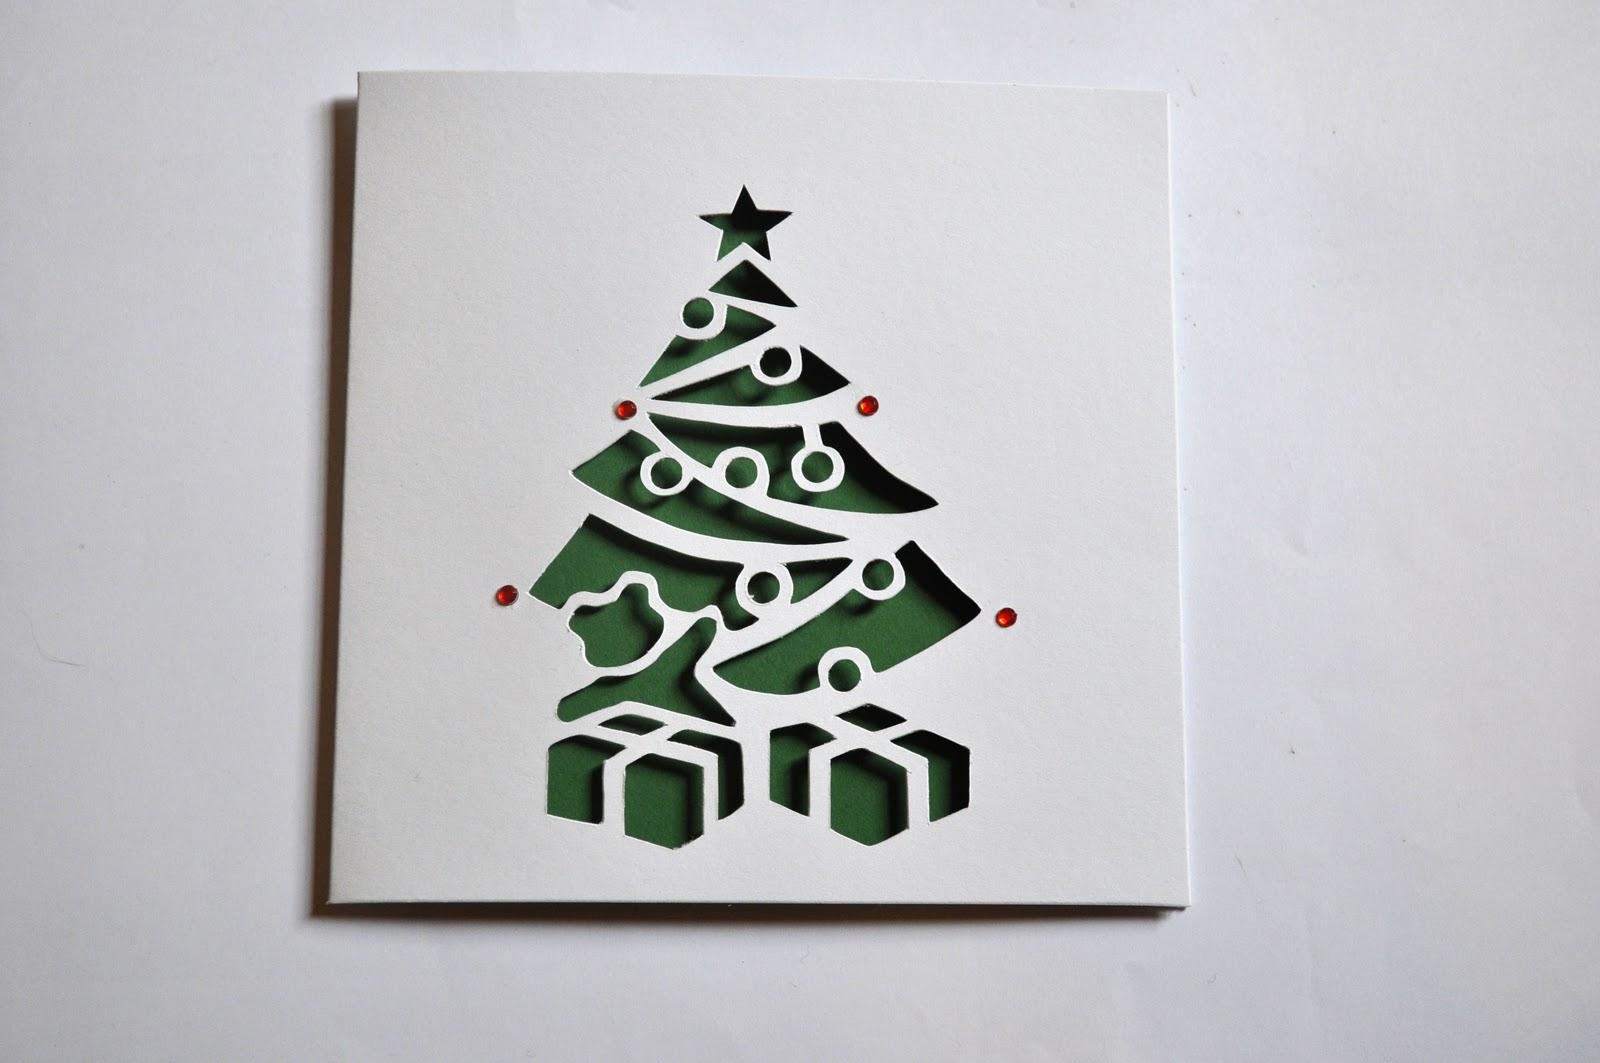 Sweet Pea Design: Christmas Tree Laser Cut Card